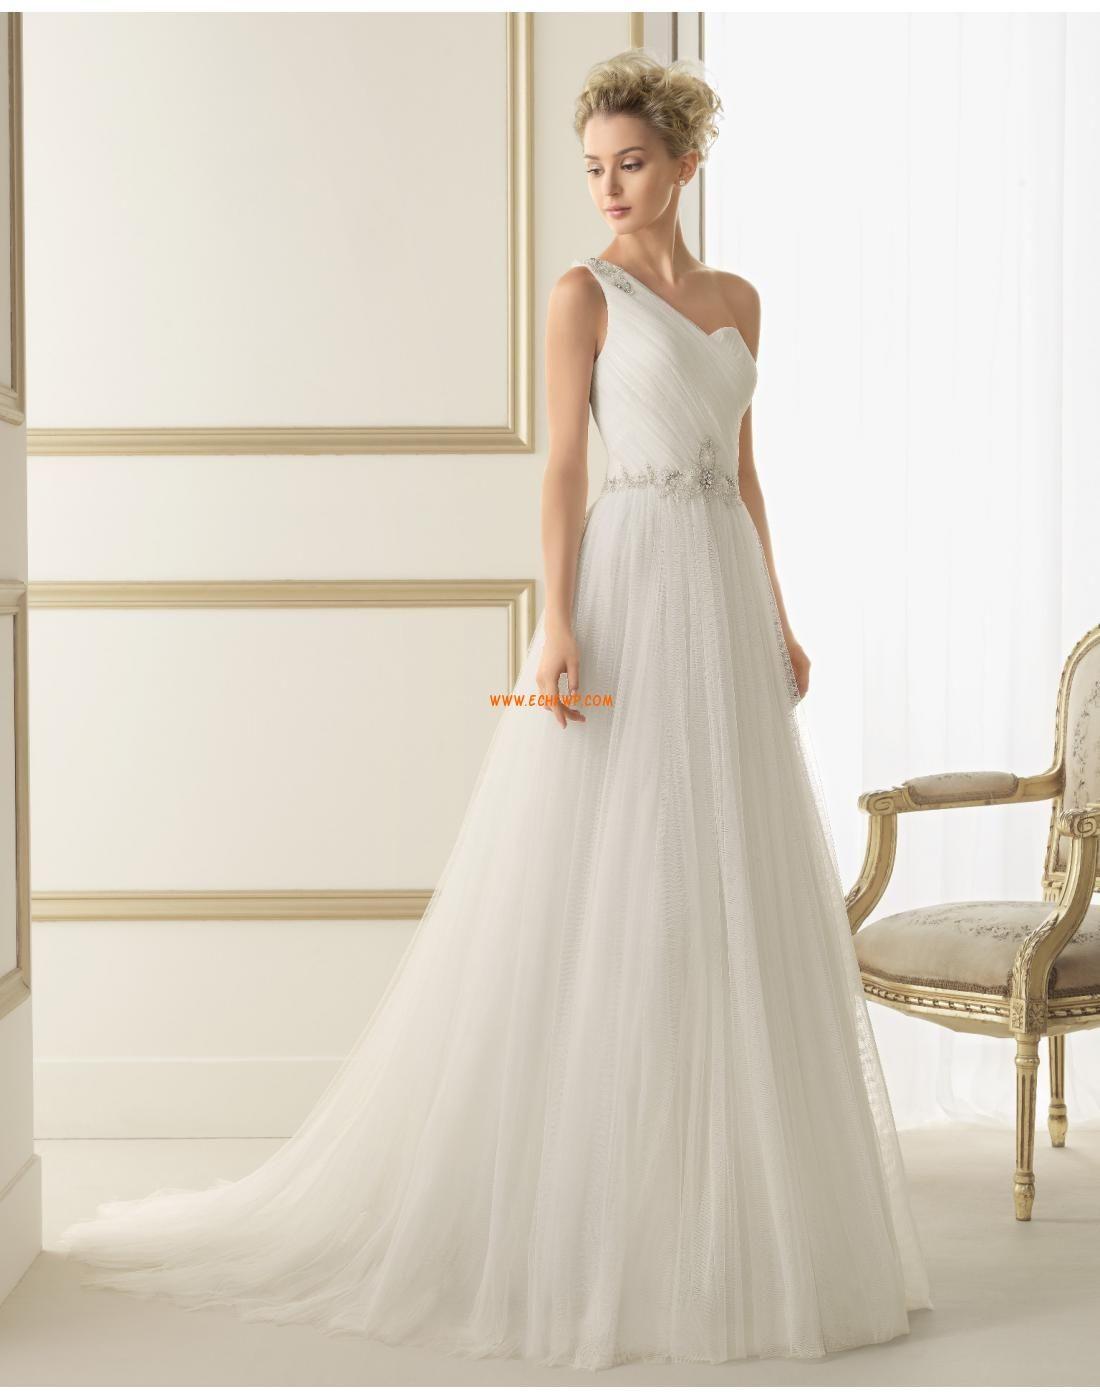 Tülle Elegant & Luxuriös Reißverschluss Brautkleider 2014 | Chiffon ...